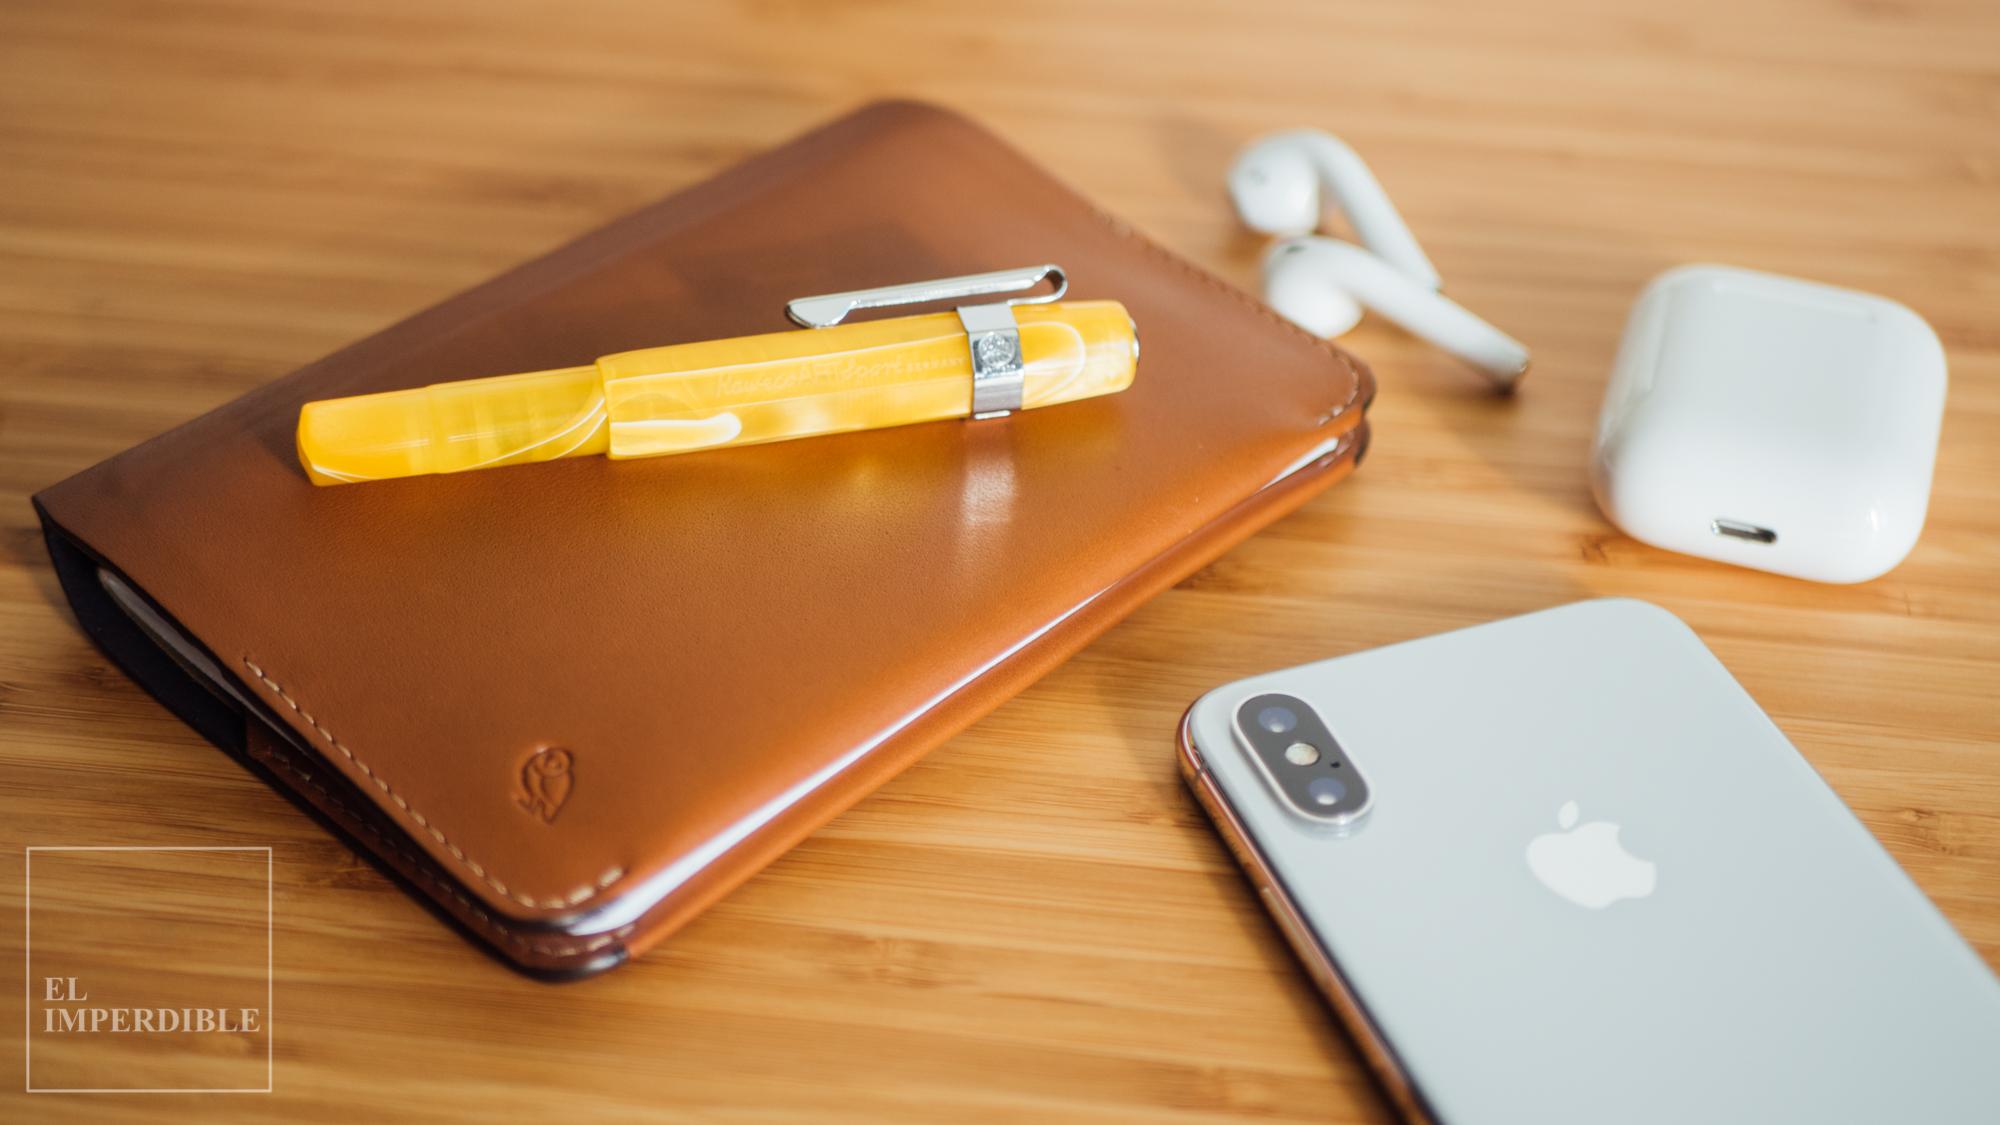 Cómo limpiar una pluma estilográfica desatascar la tinta seca Kaweco Sport artsport bellroy fieldnotes iphone xs